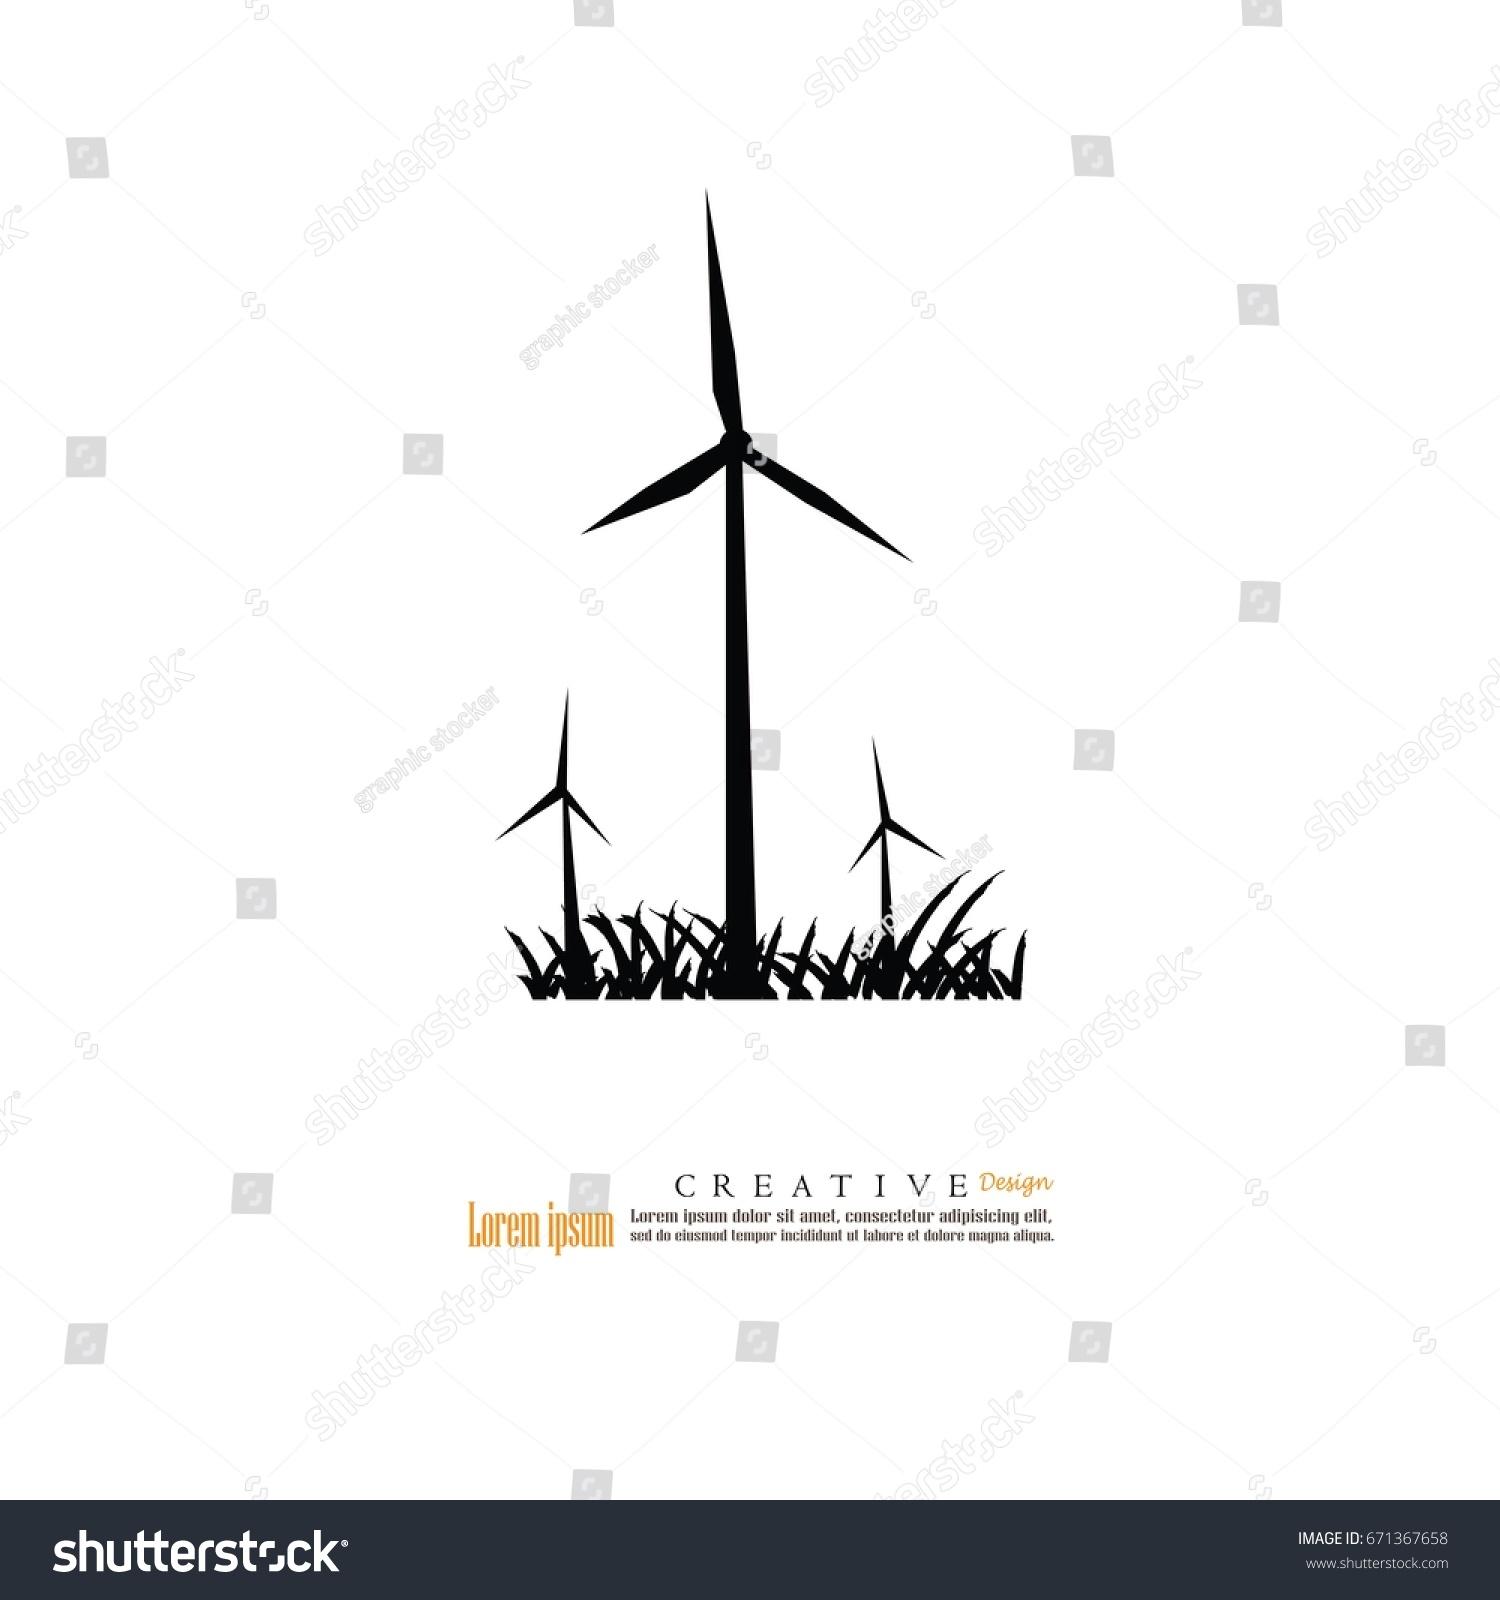 Windturbine Iconvector Illustration Stock Vector 671367658 ...